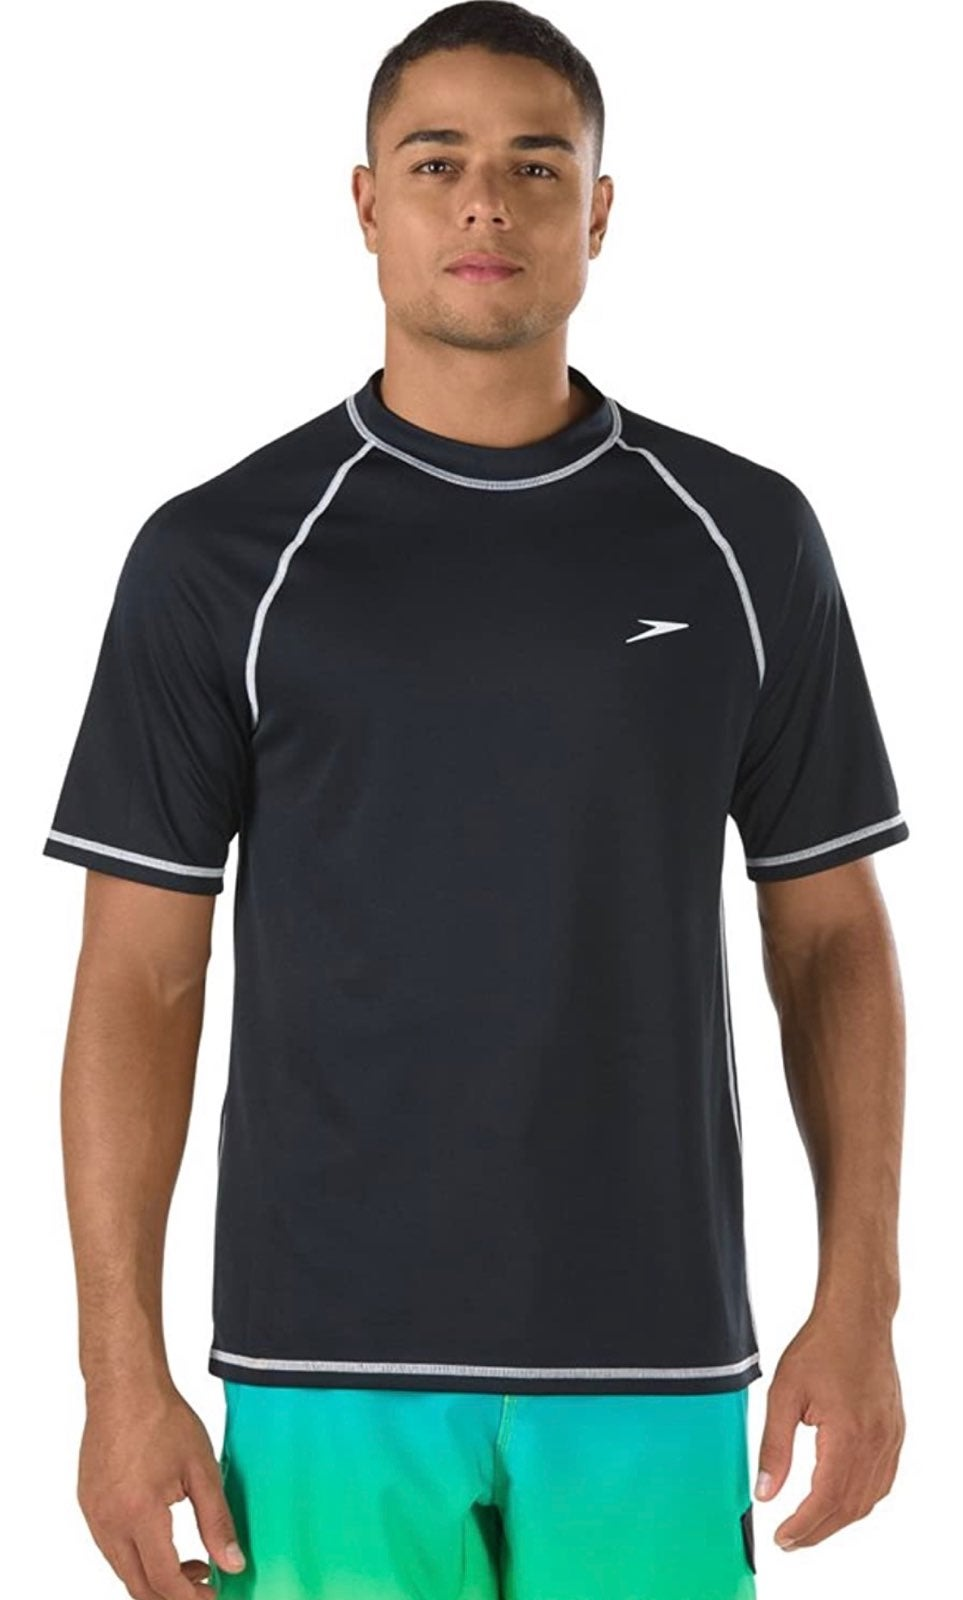 Speedo Men's UV Swim Shirt Short Sleeve